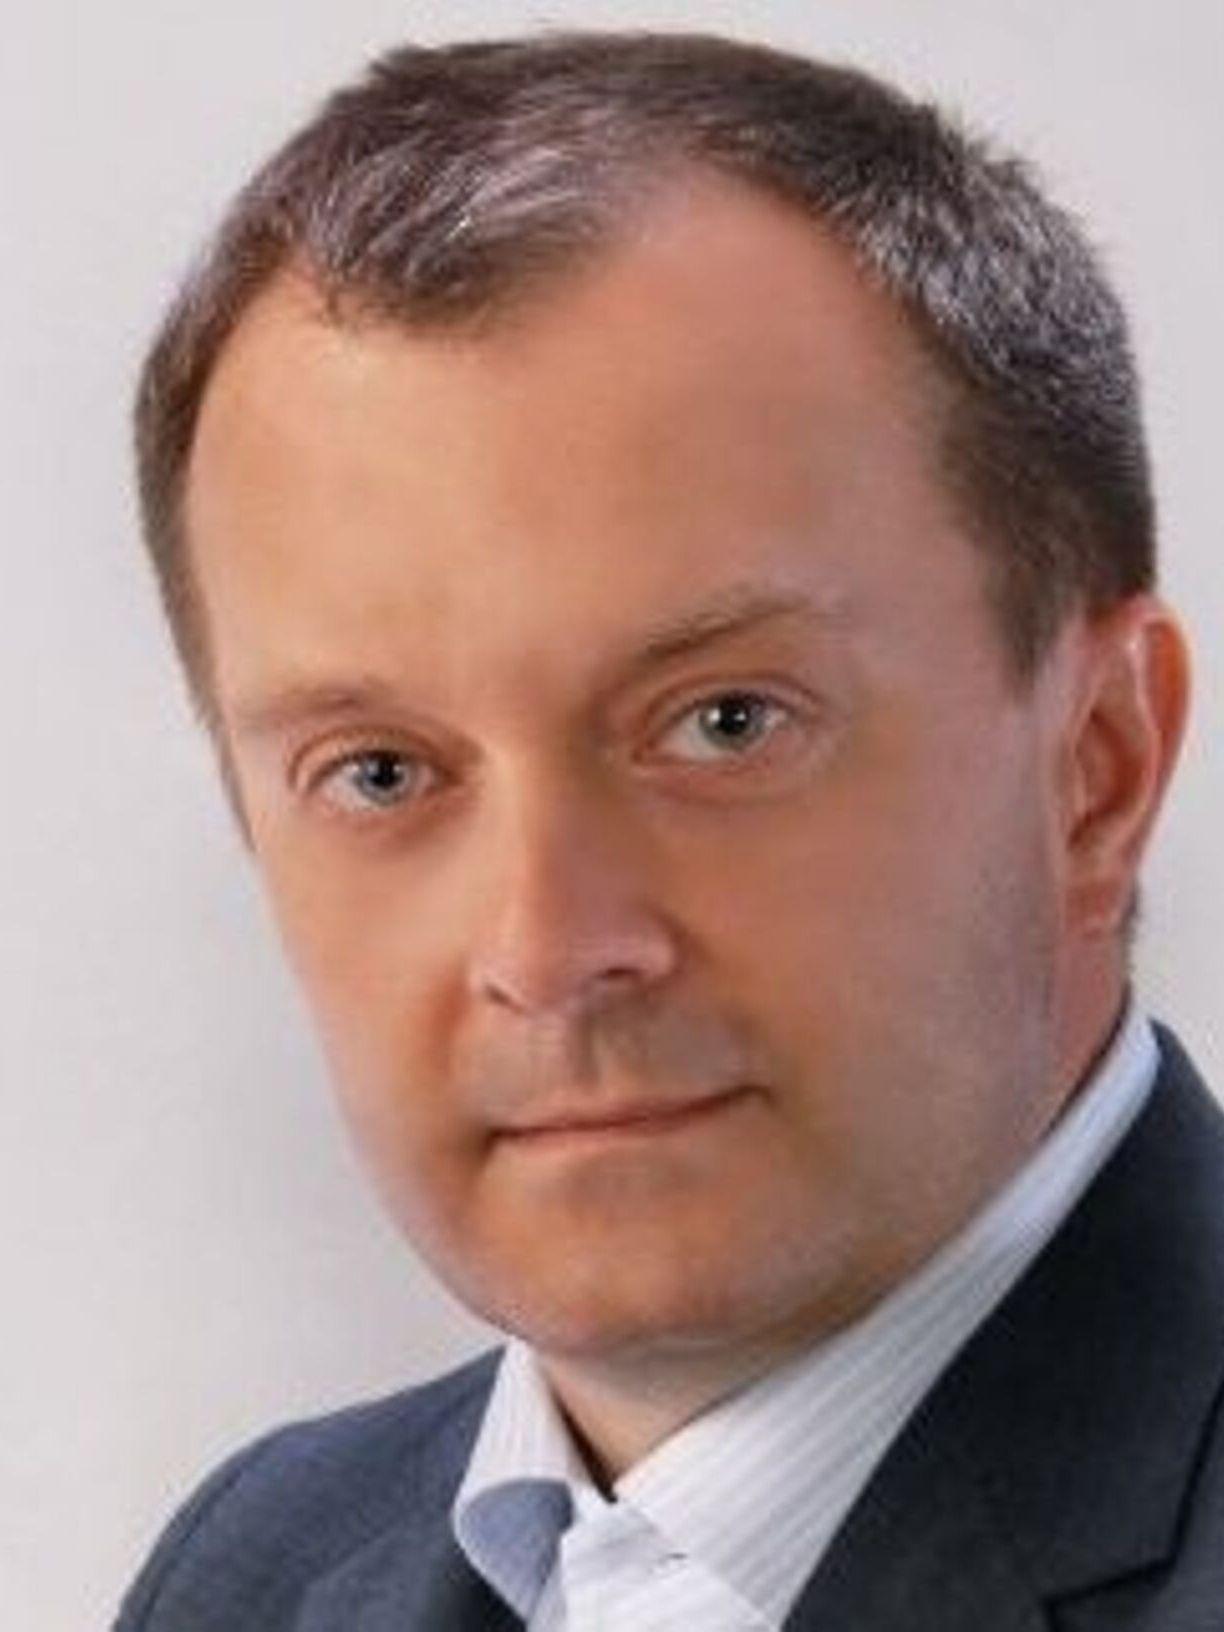 Piotr Hanus